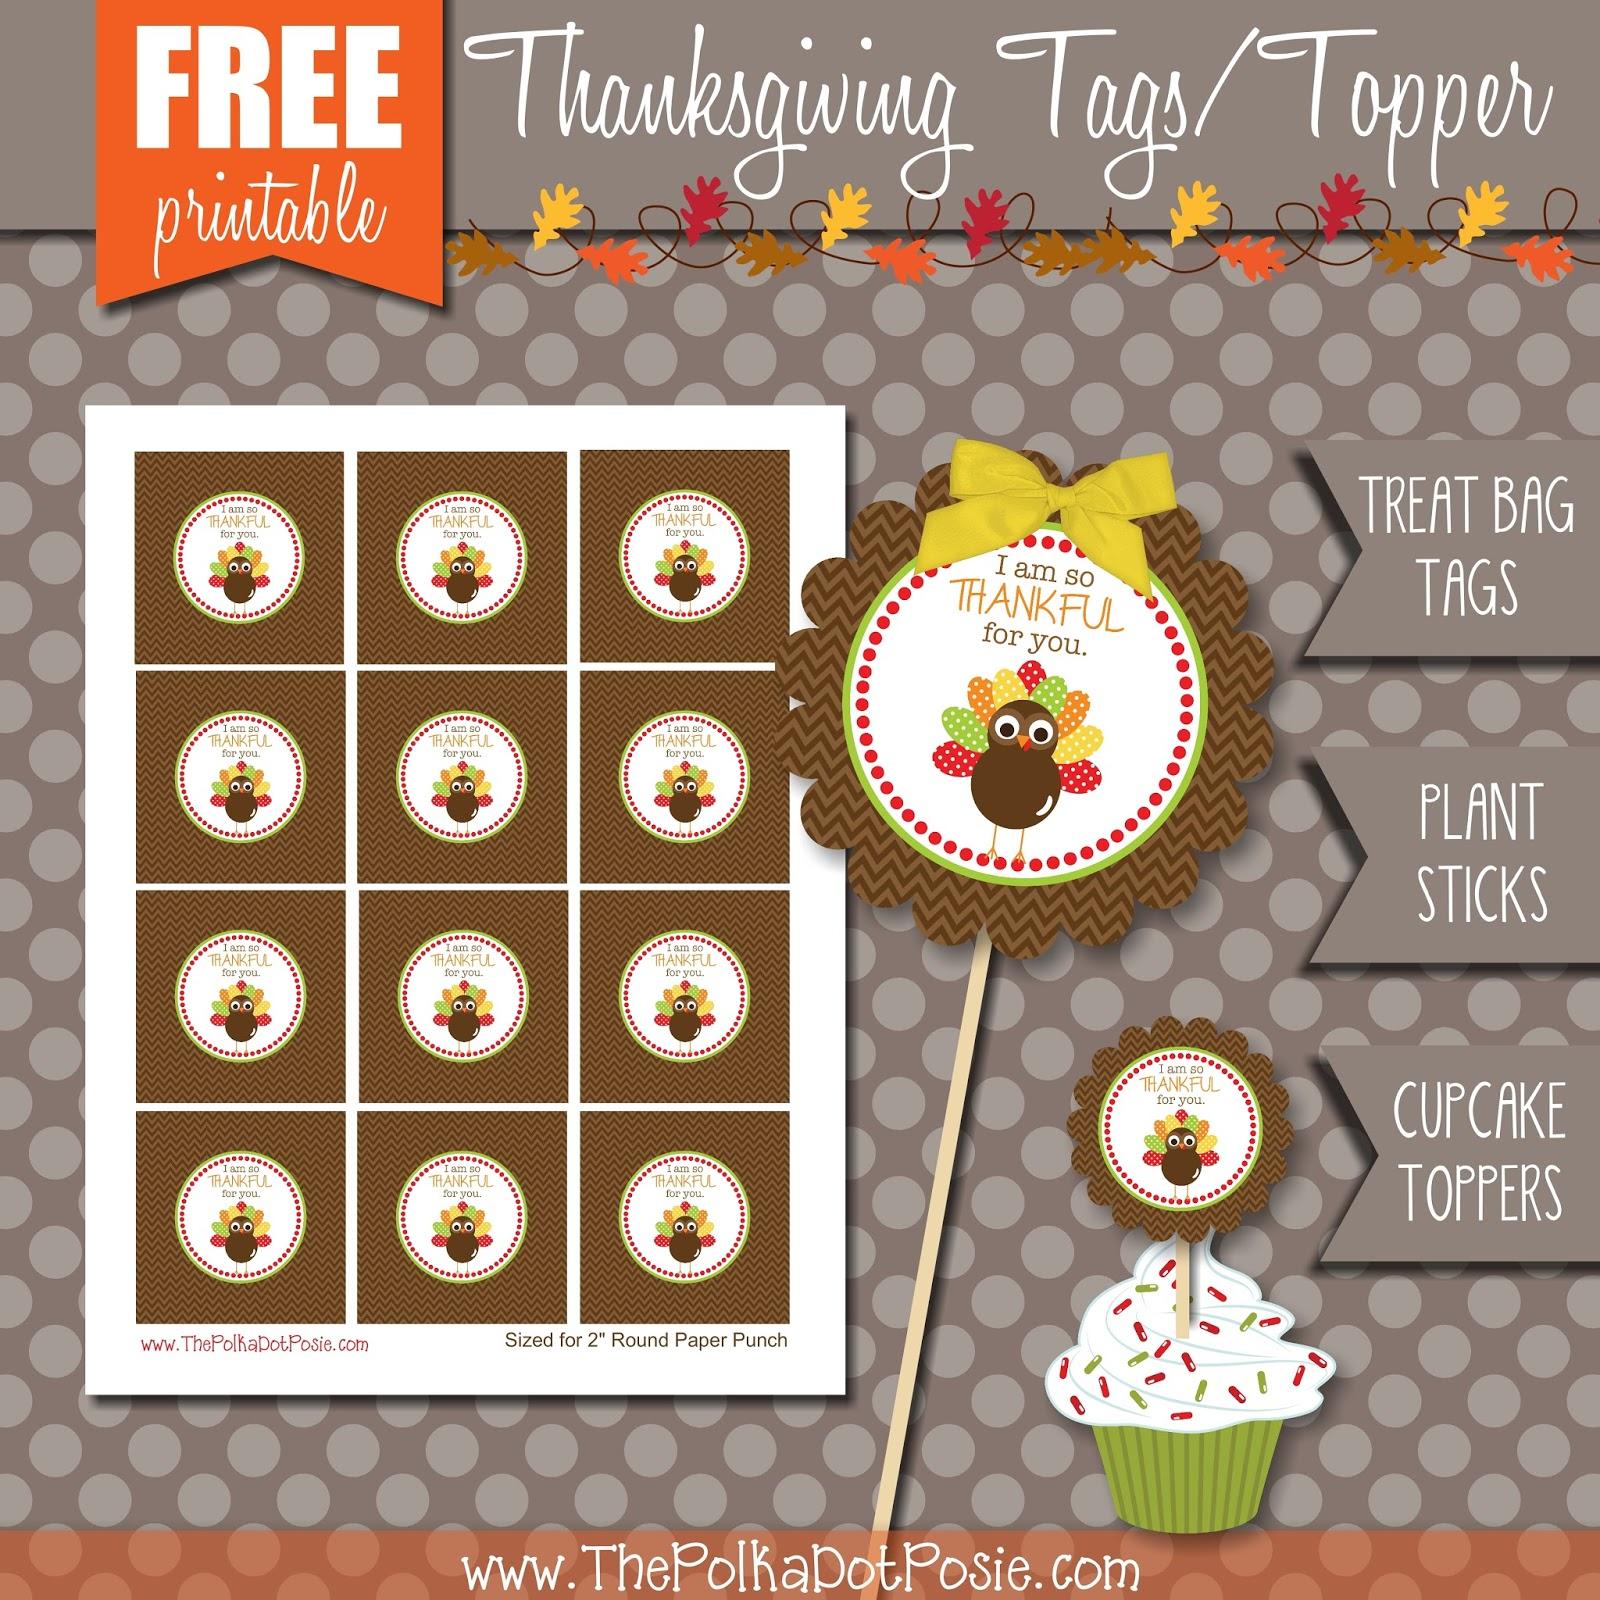 image about Free Printable Thanksgiving Tags identify The Polka Dot Posie: Thanksgiving Printable Goodies!